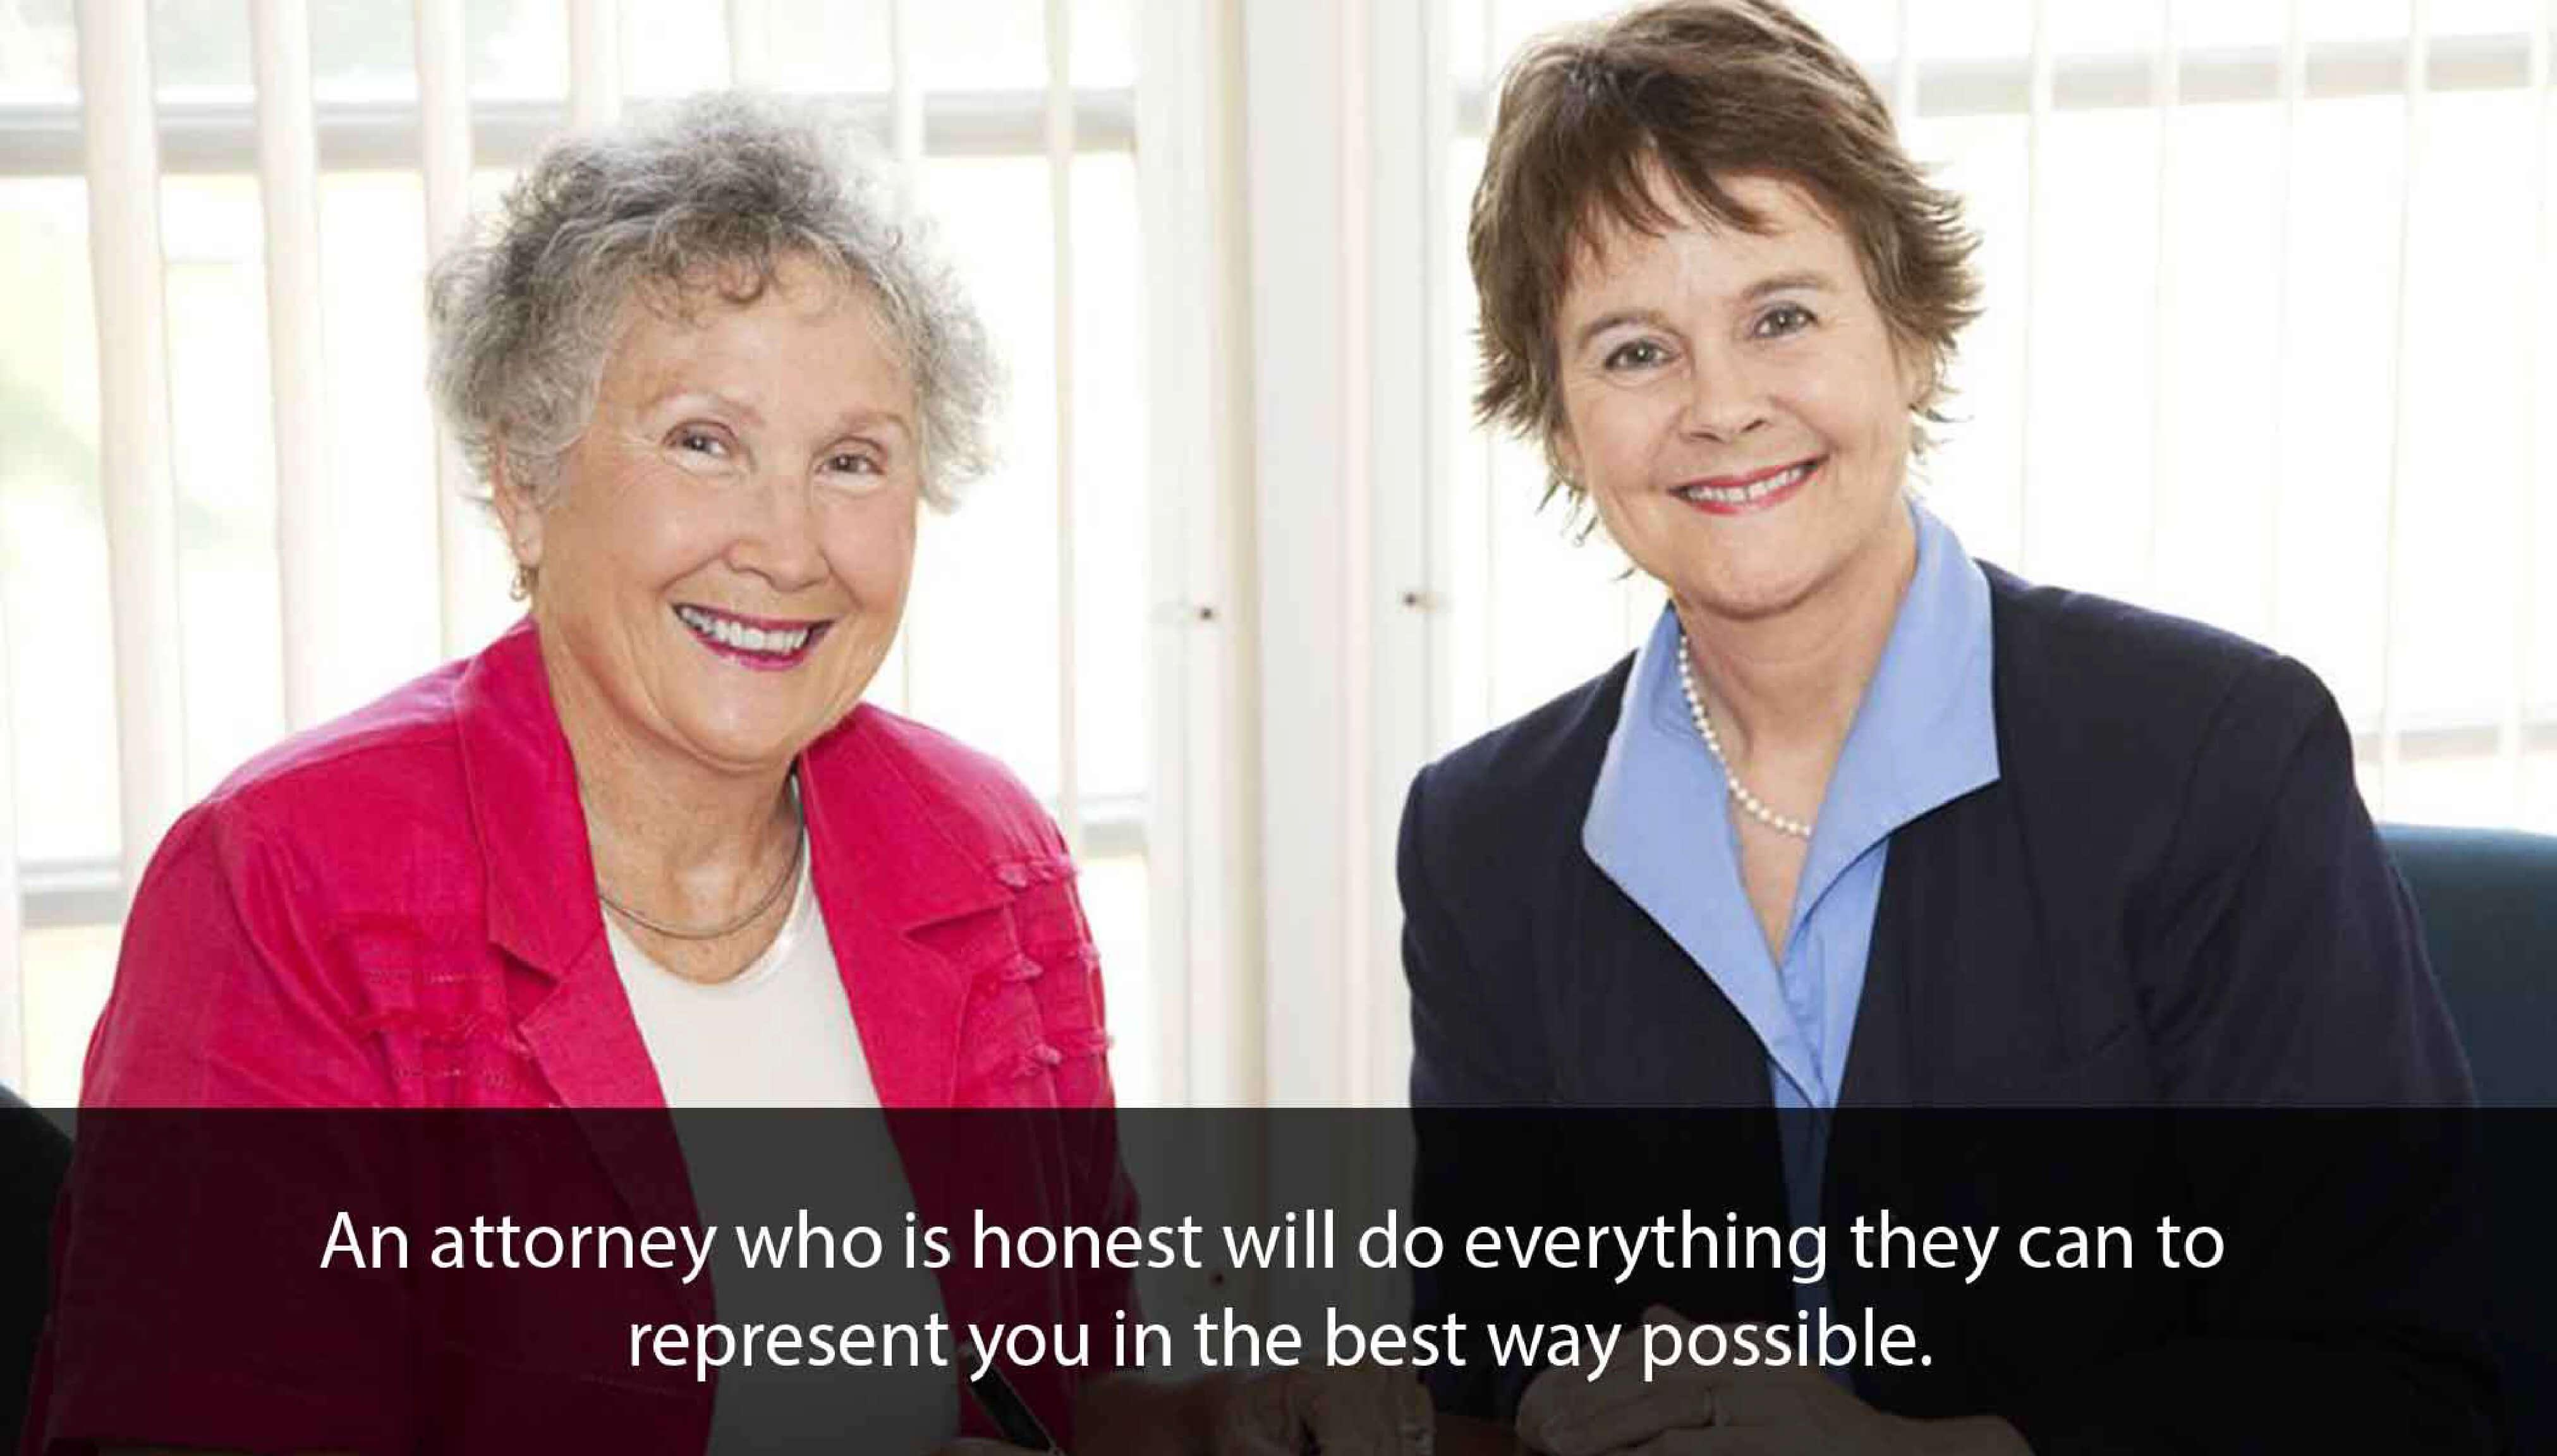 Honest Attorney